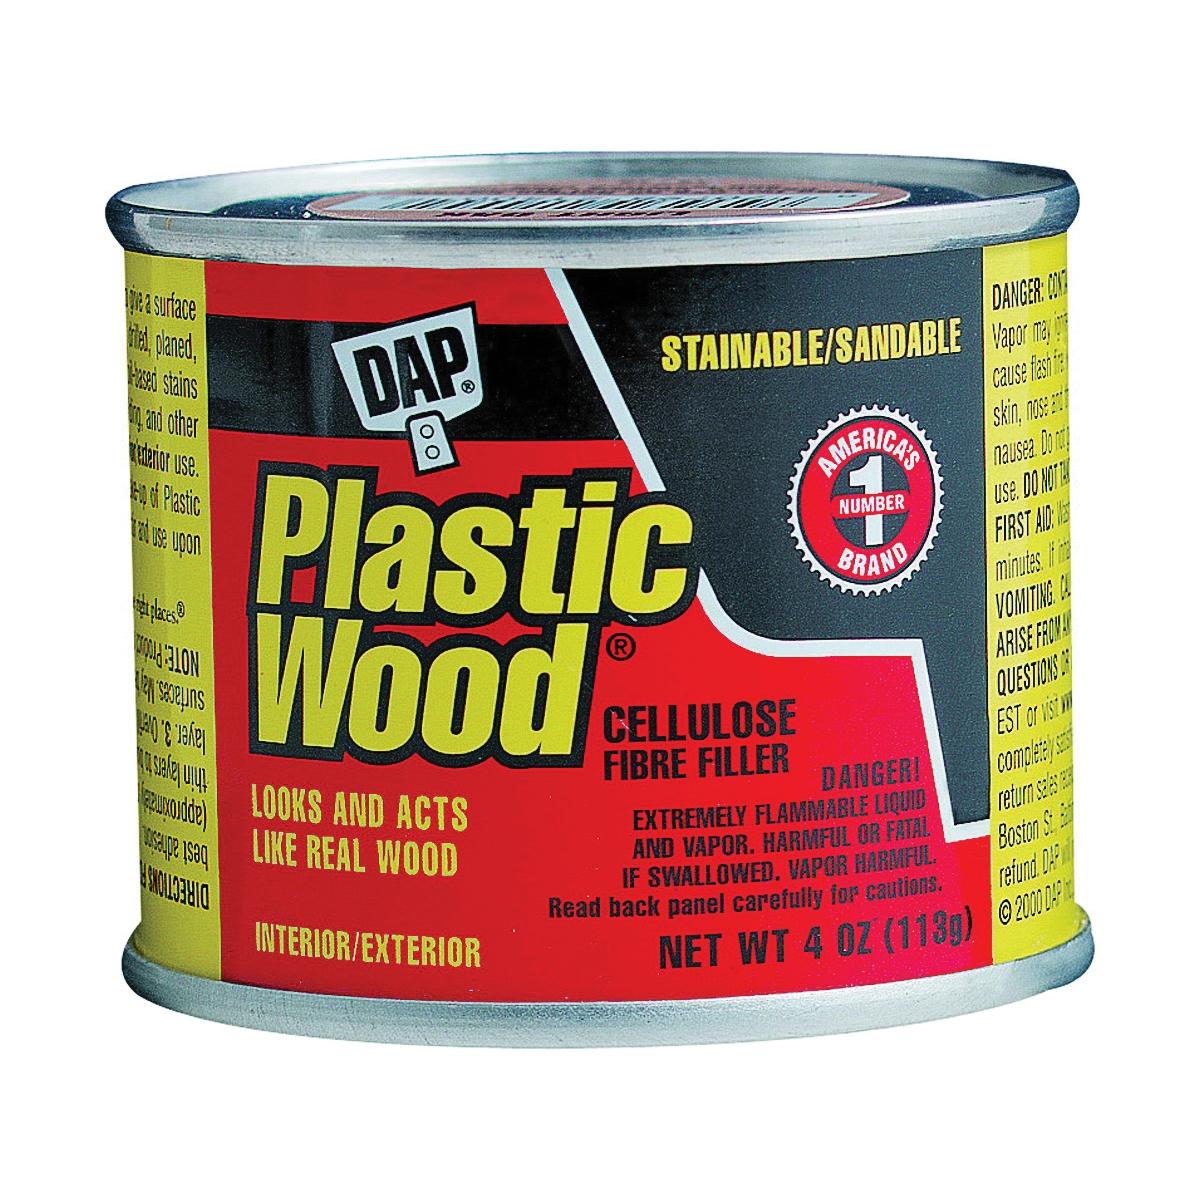 Picture of DAP Plastic Wood 21408 Wood Filler, Paste, Strong Solvent, Golden Oak, 4 oz Package